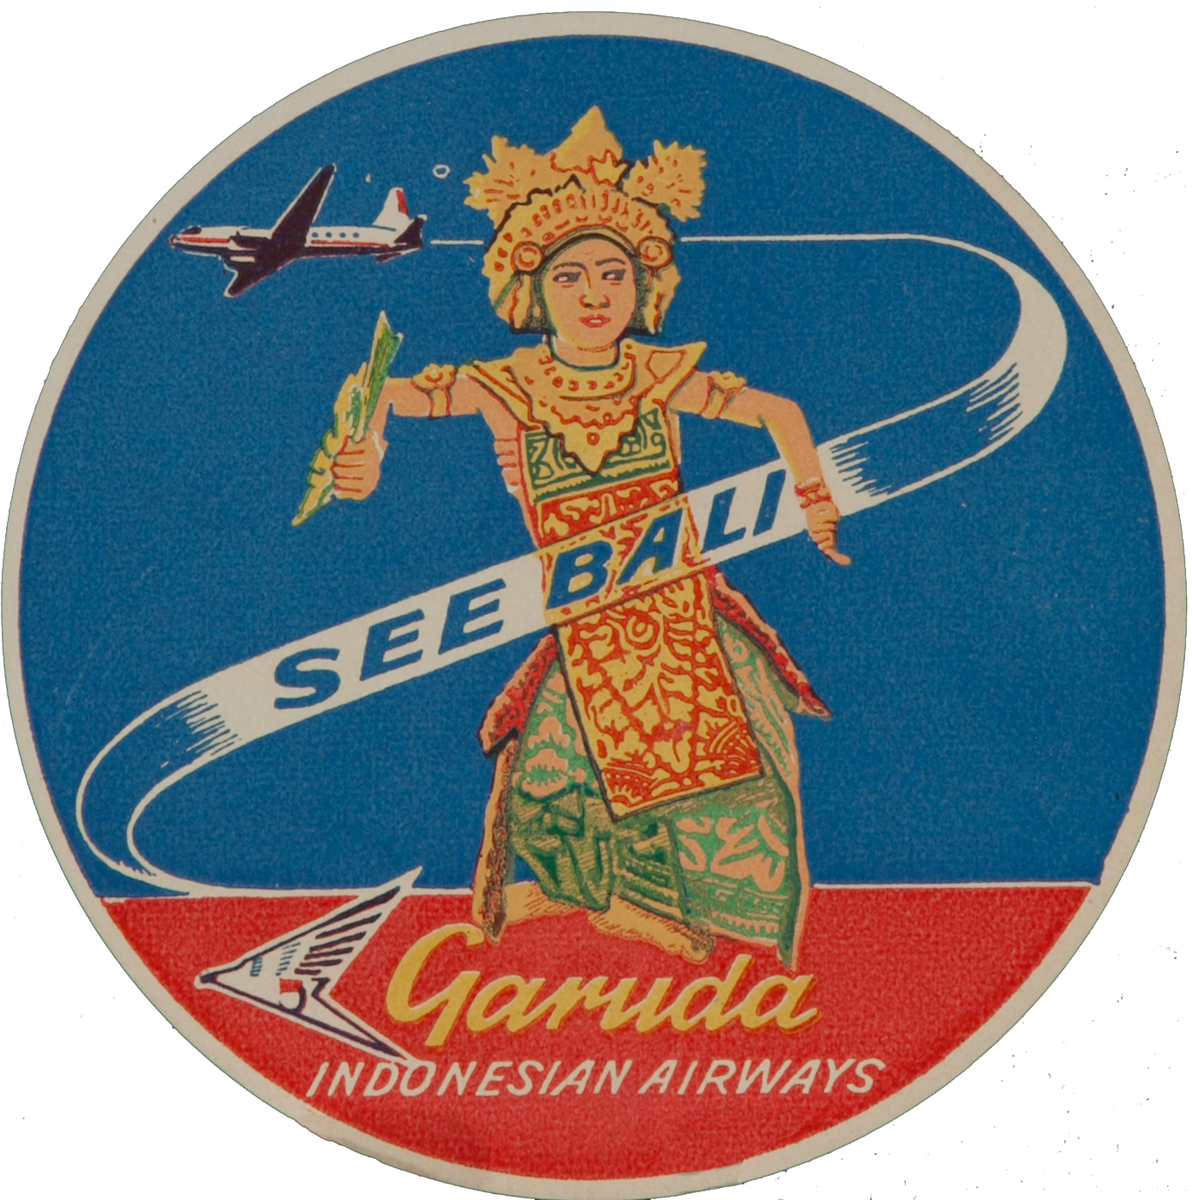 See Bali, Garuda Indonesian Airways Luggage Label